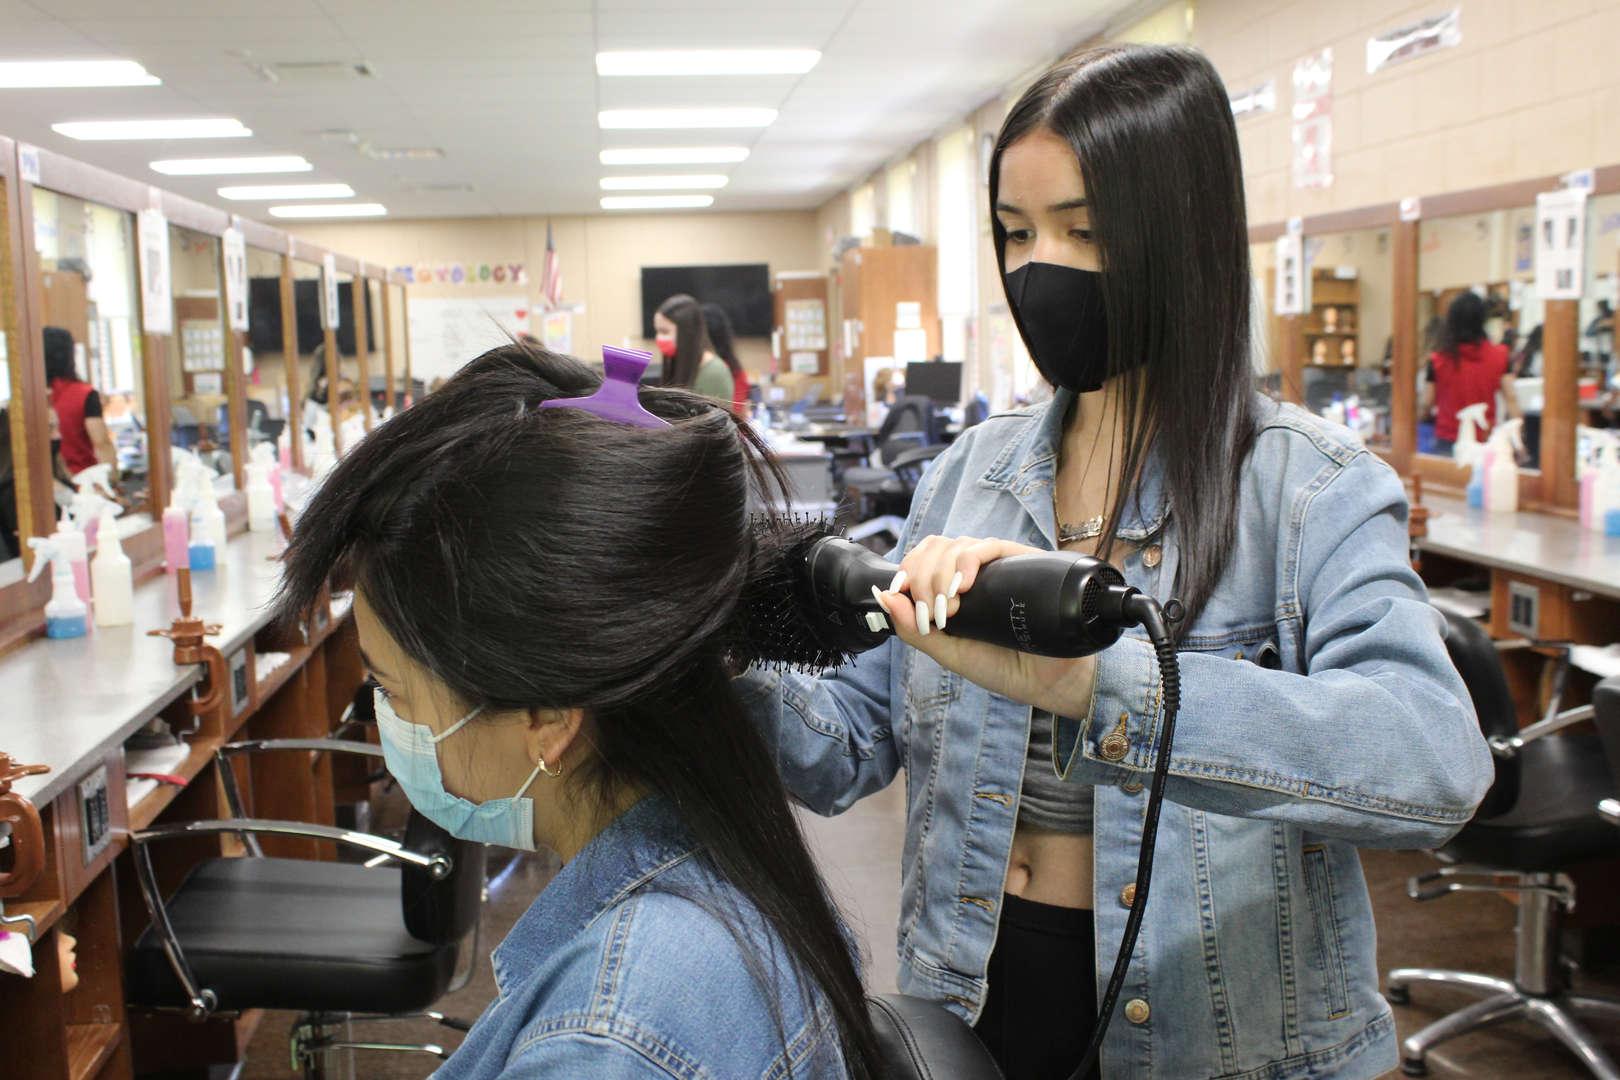 Girl using flatiron tool on another girl's hair